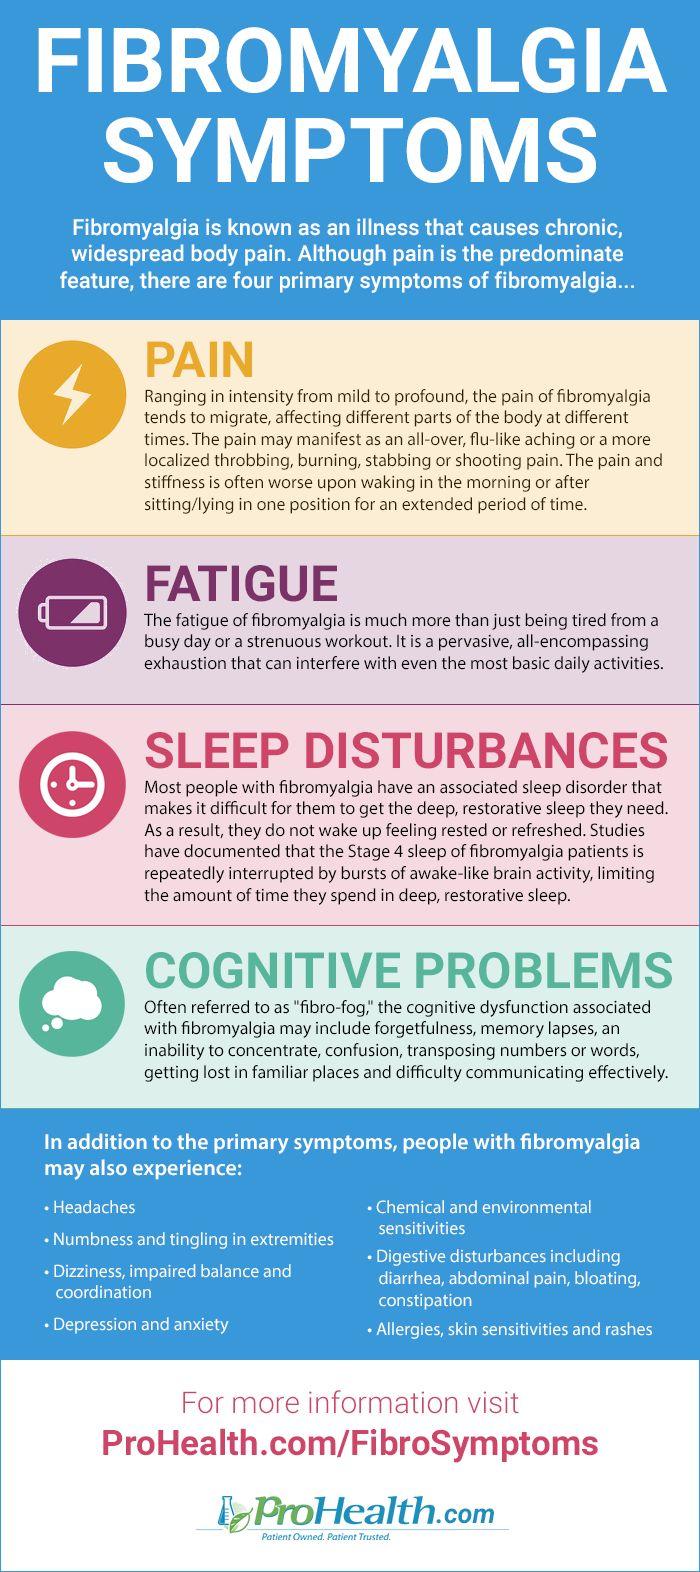 Fibromyalgia Symptoms via ProHealth.com